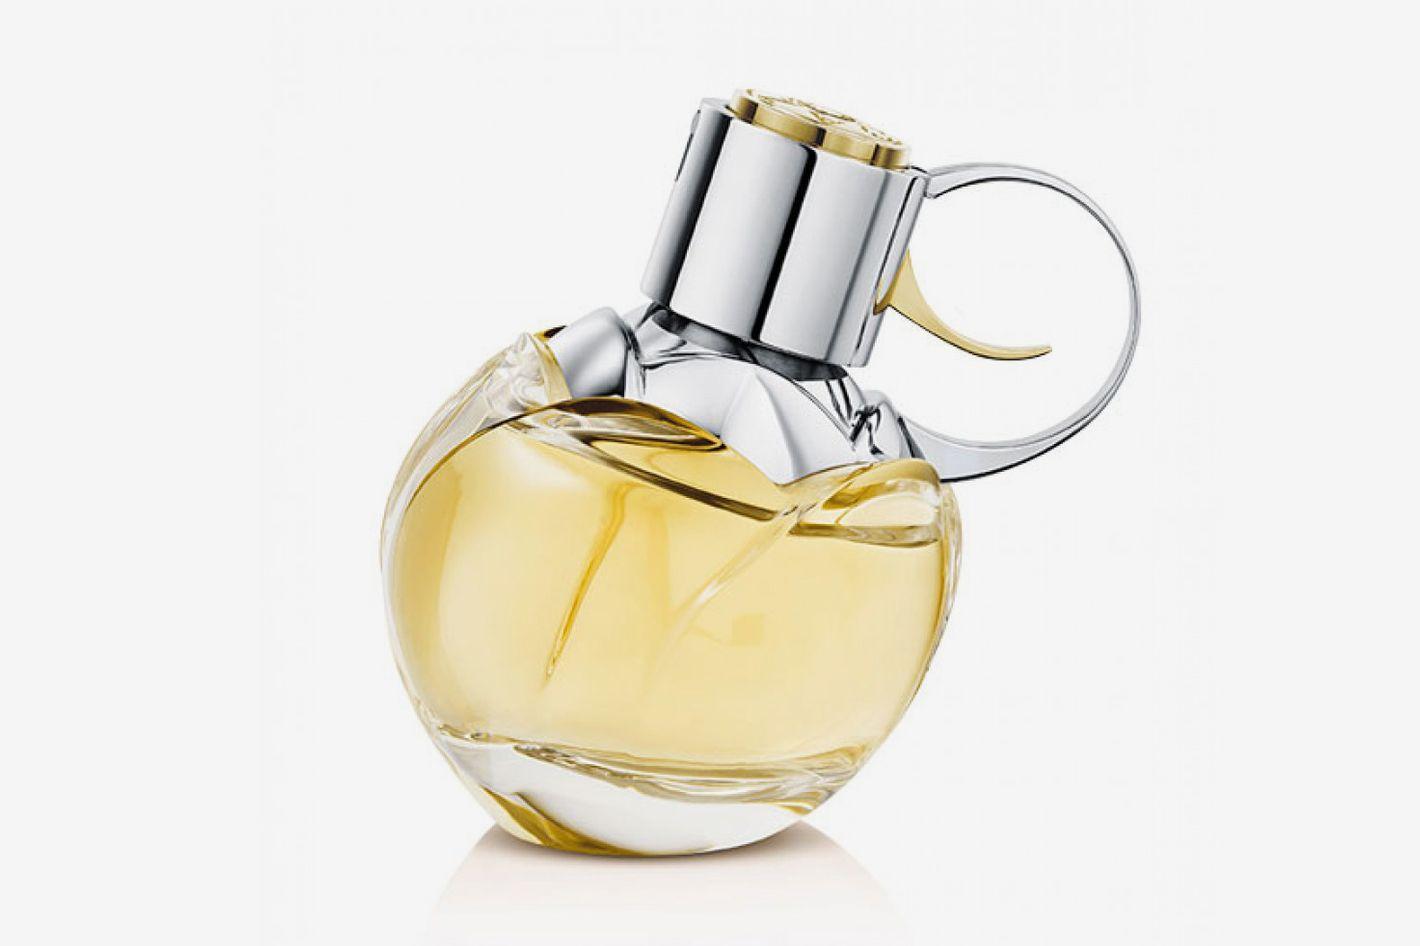 Azzaro Wanted Girl Eau de Perfume